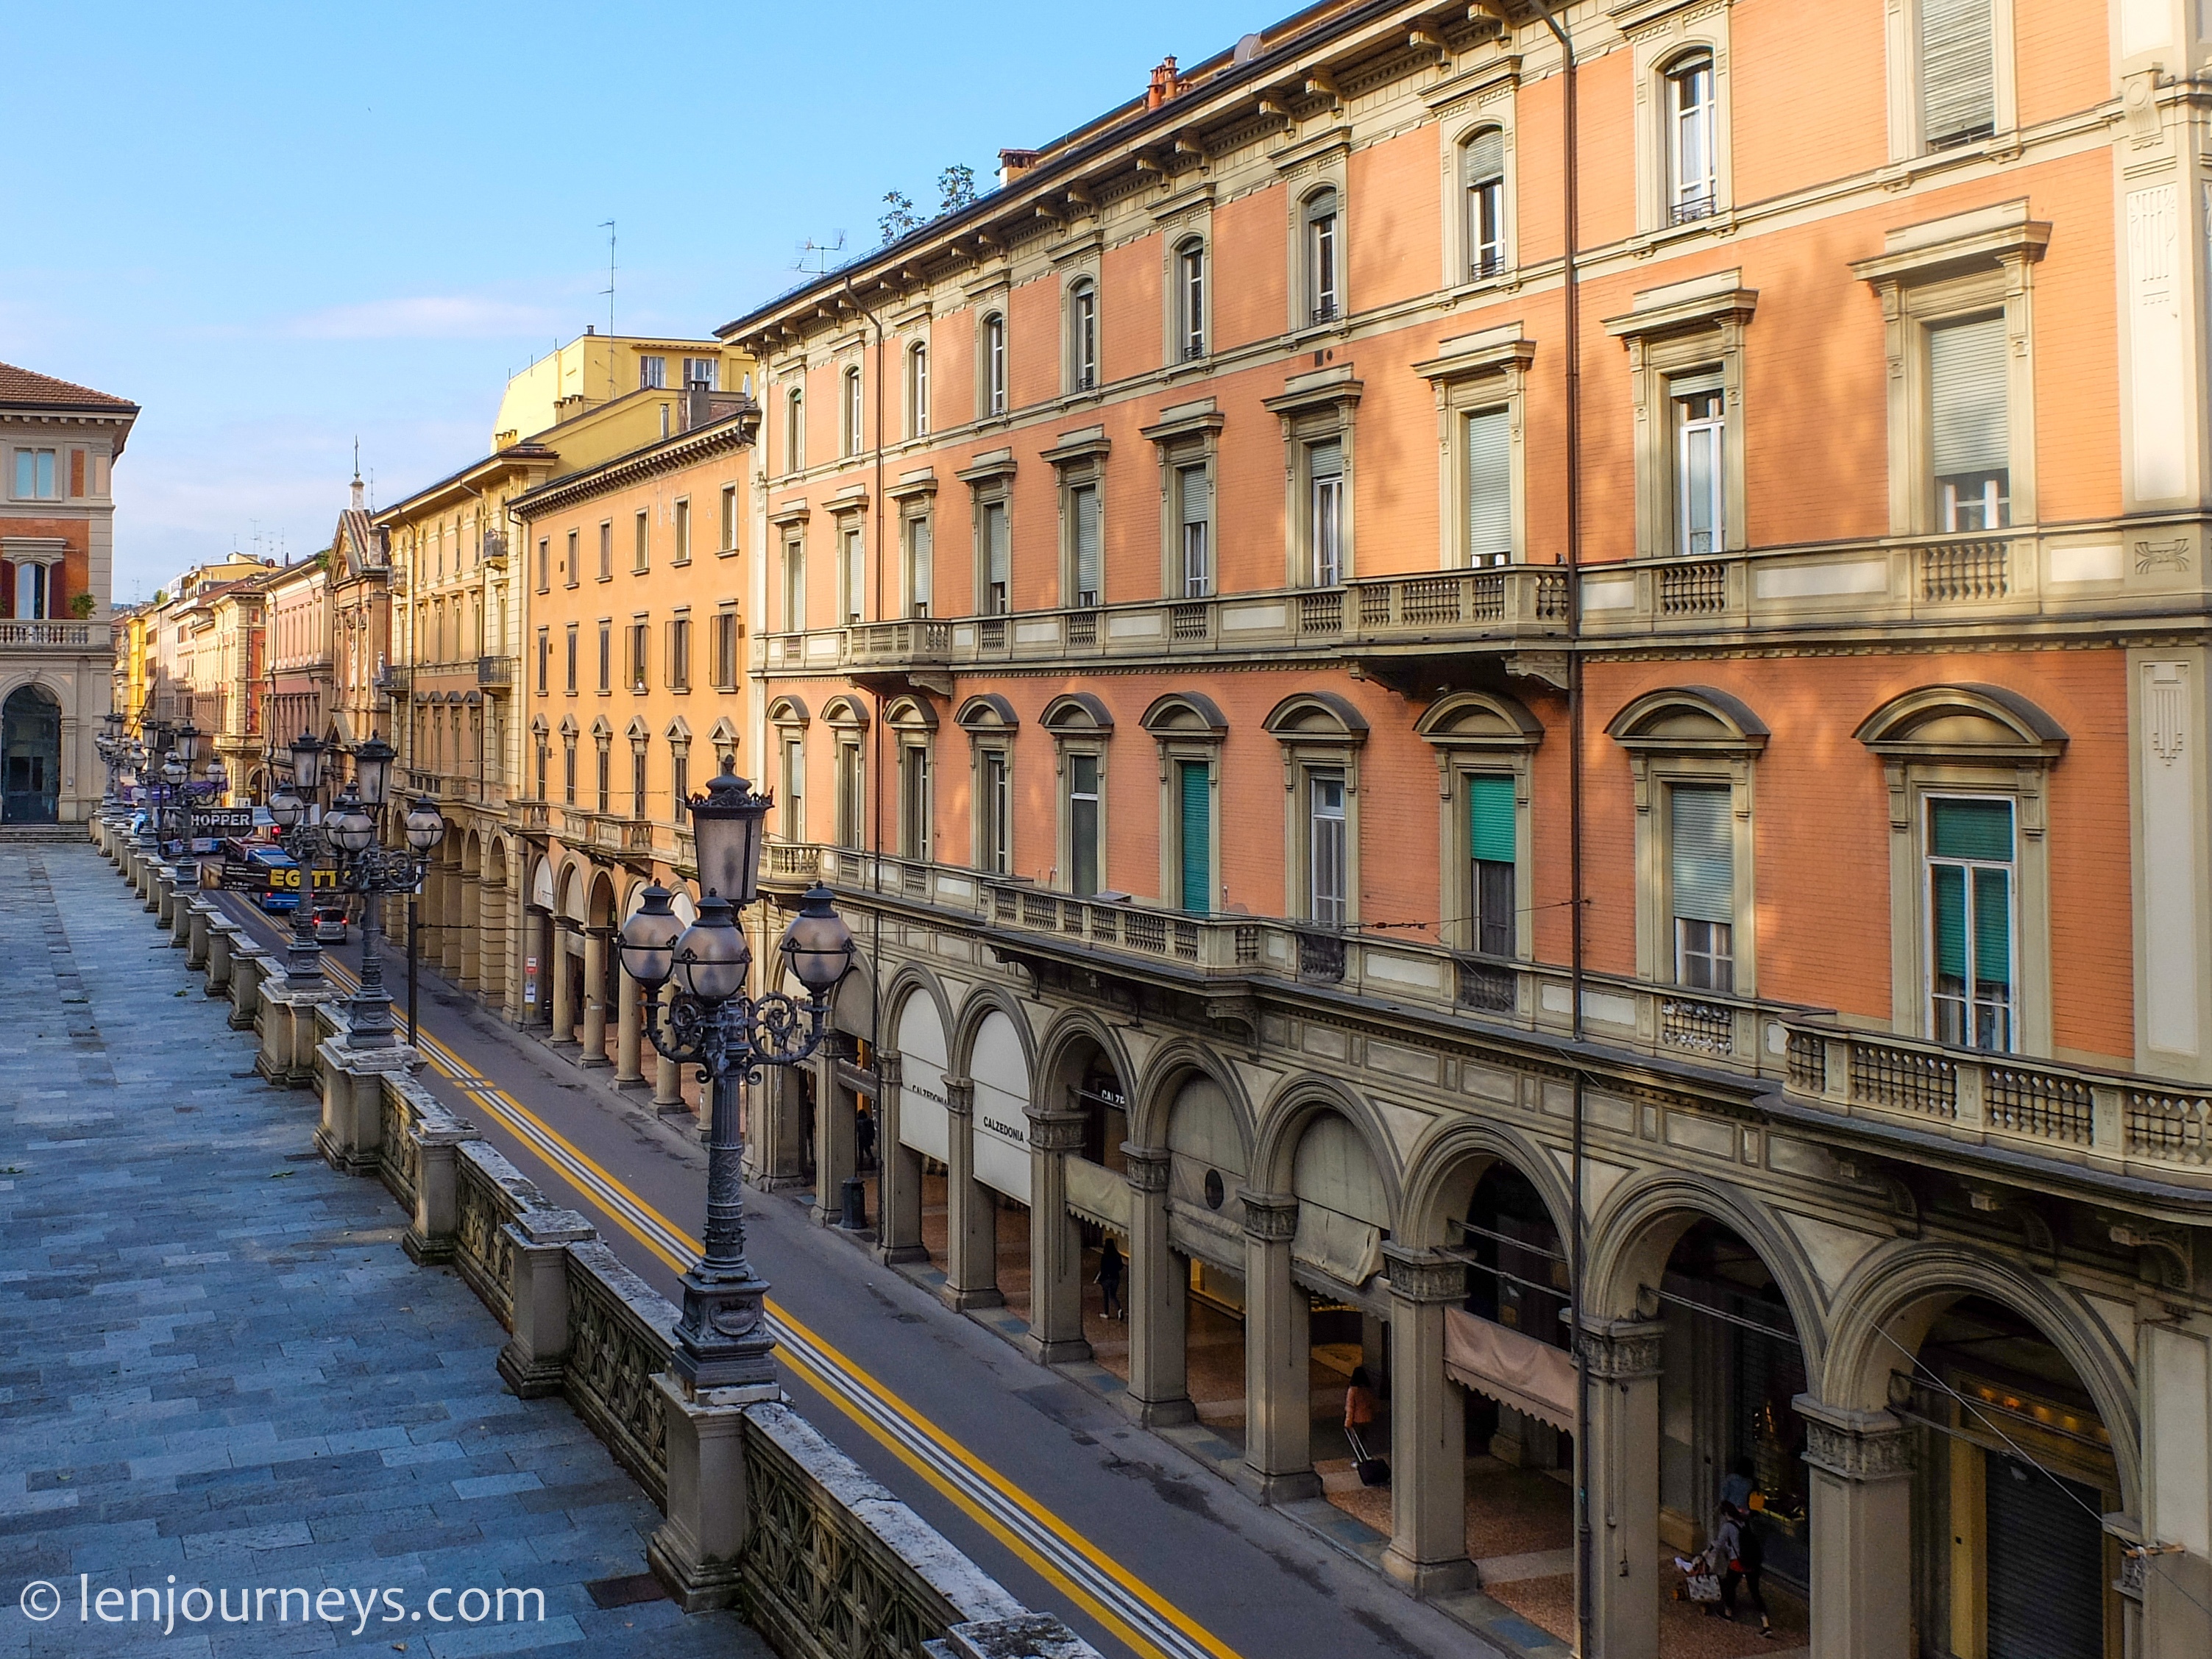 Buildings in Bologna